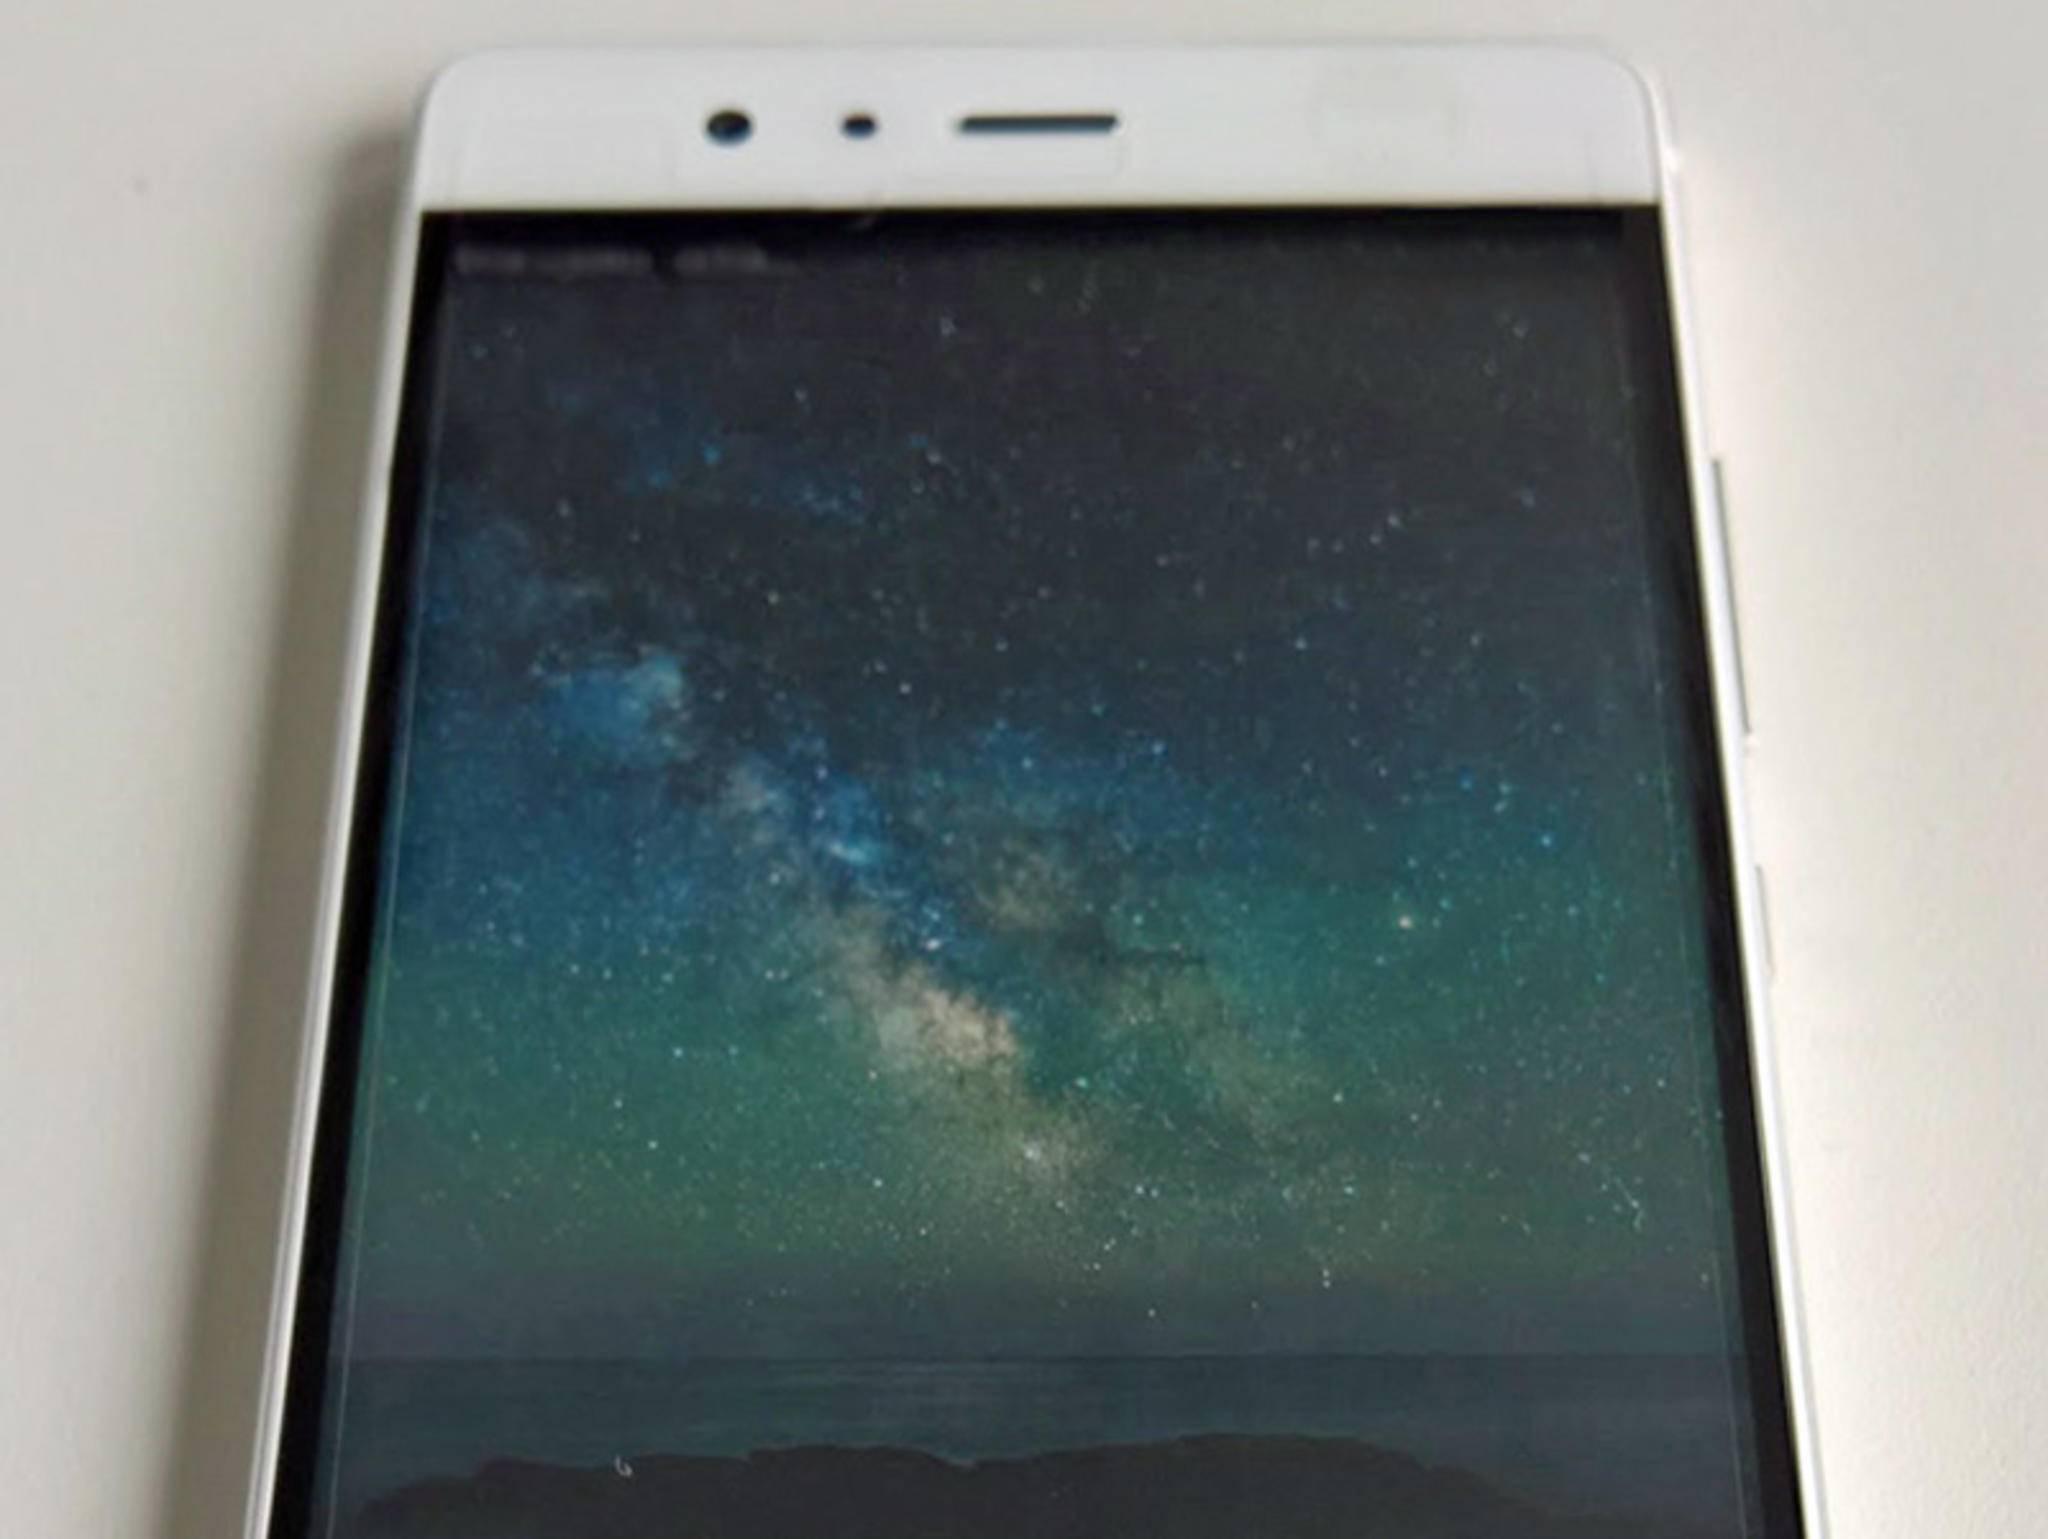 Am 6. April dürfte Huawei sein P9 enthüllen.